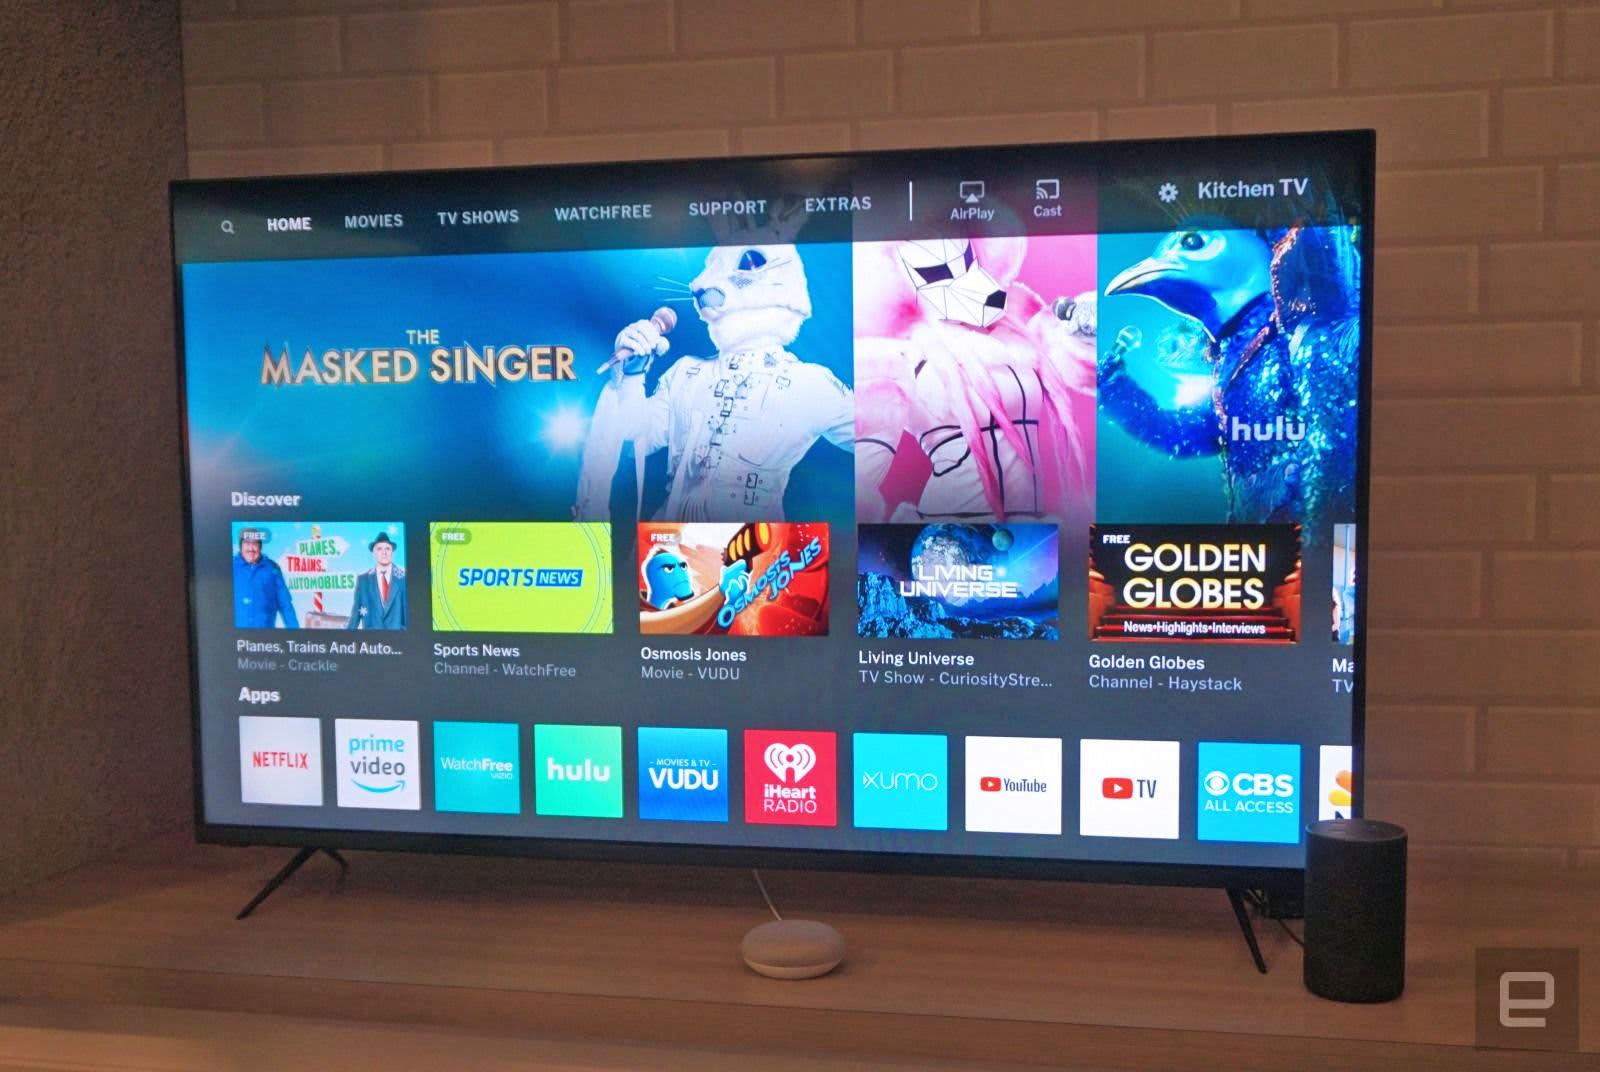 Vizio begins updating its TVs with AirPlay 2 and HomeKit